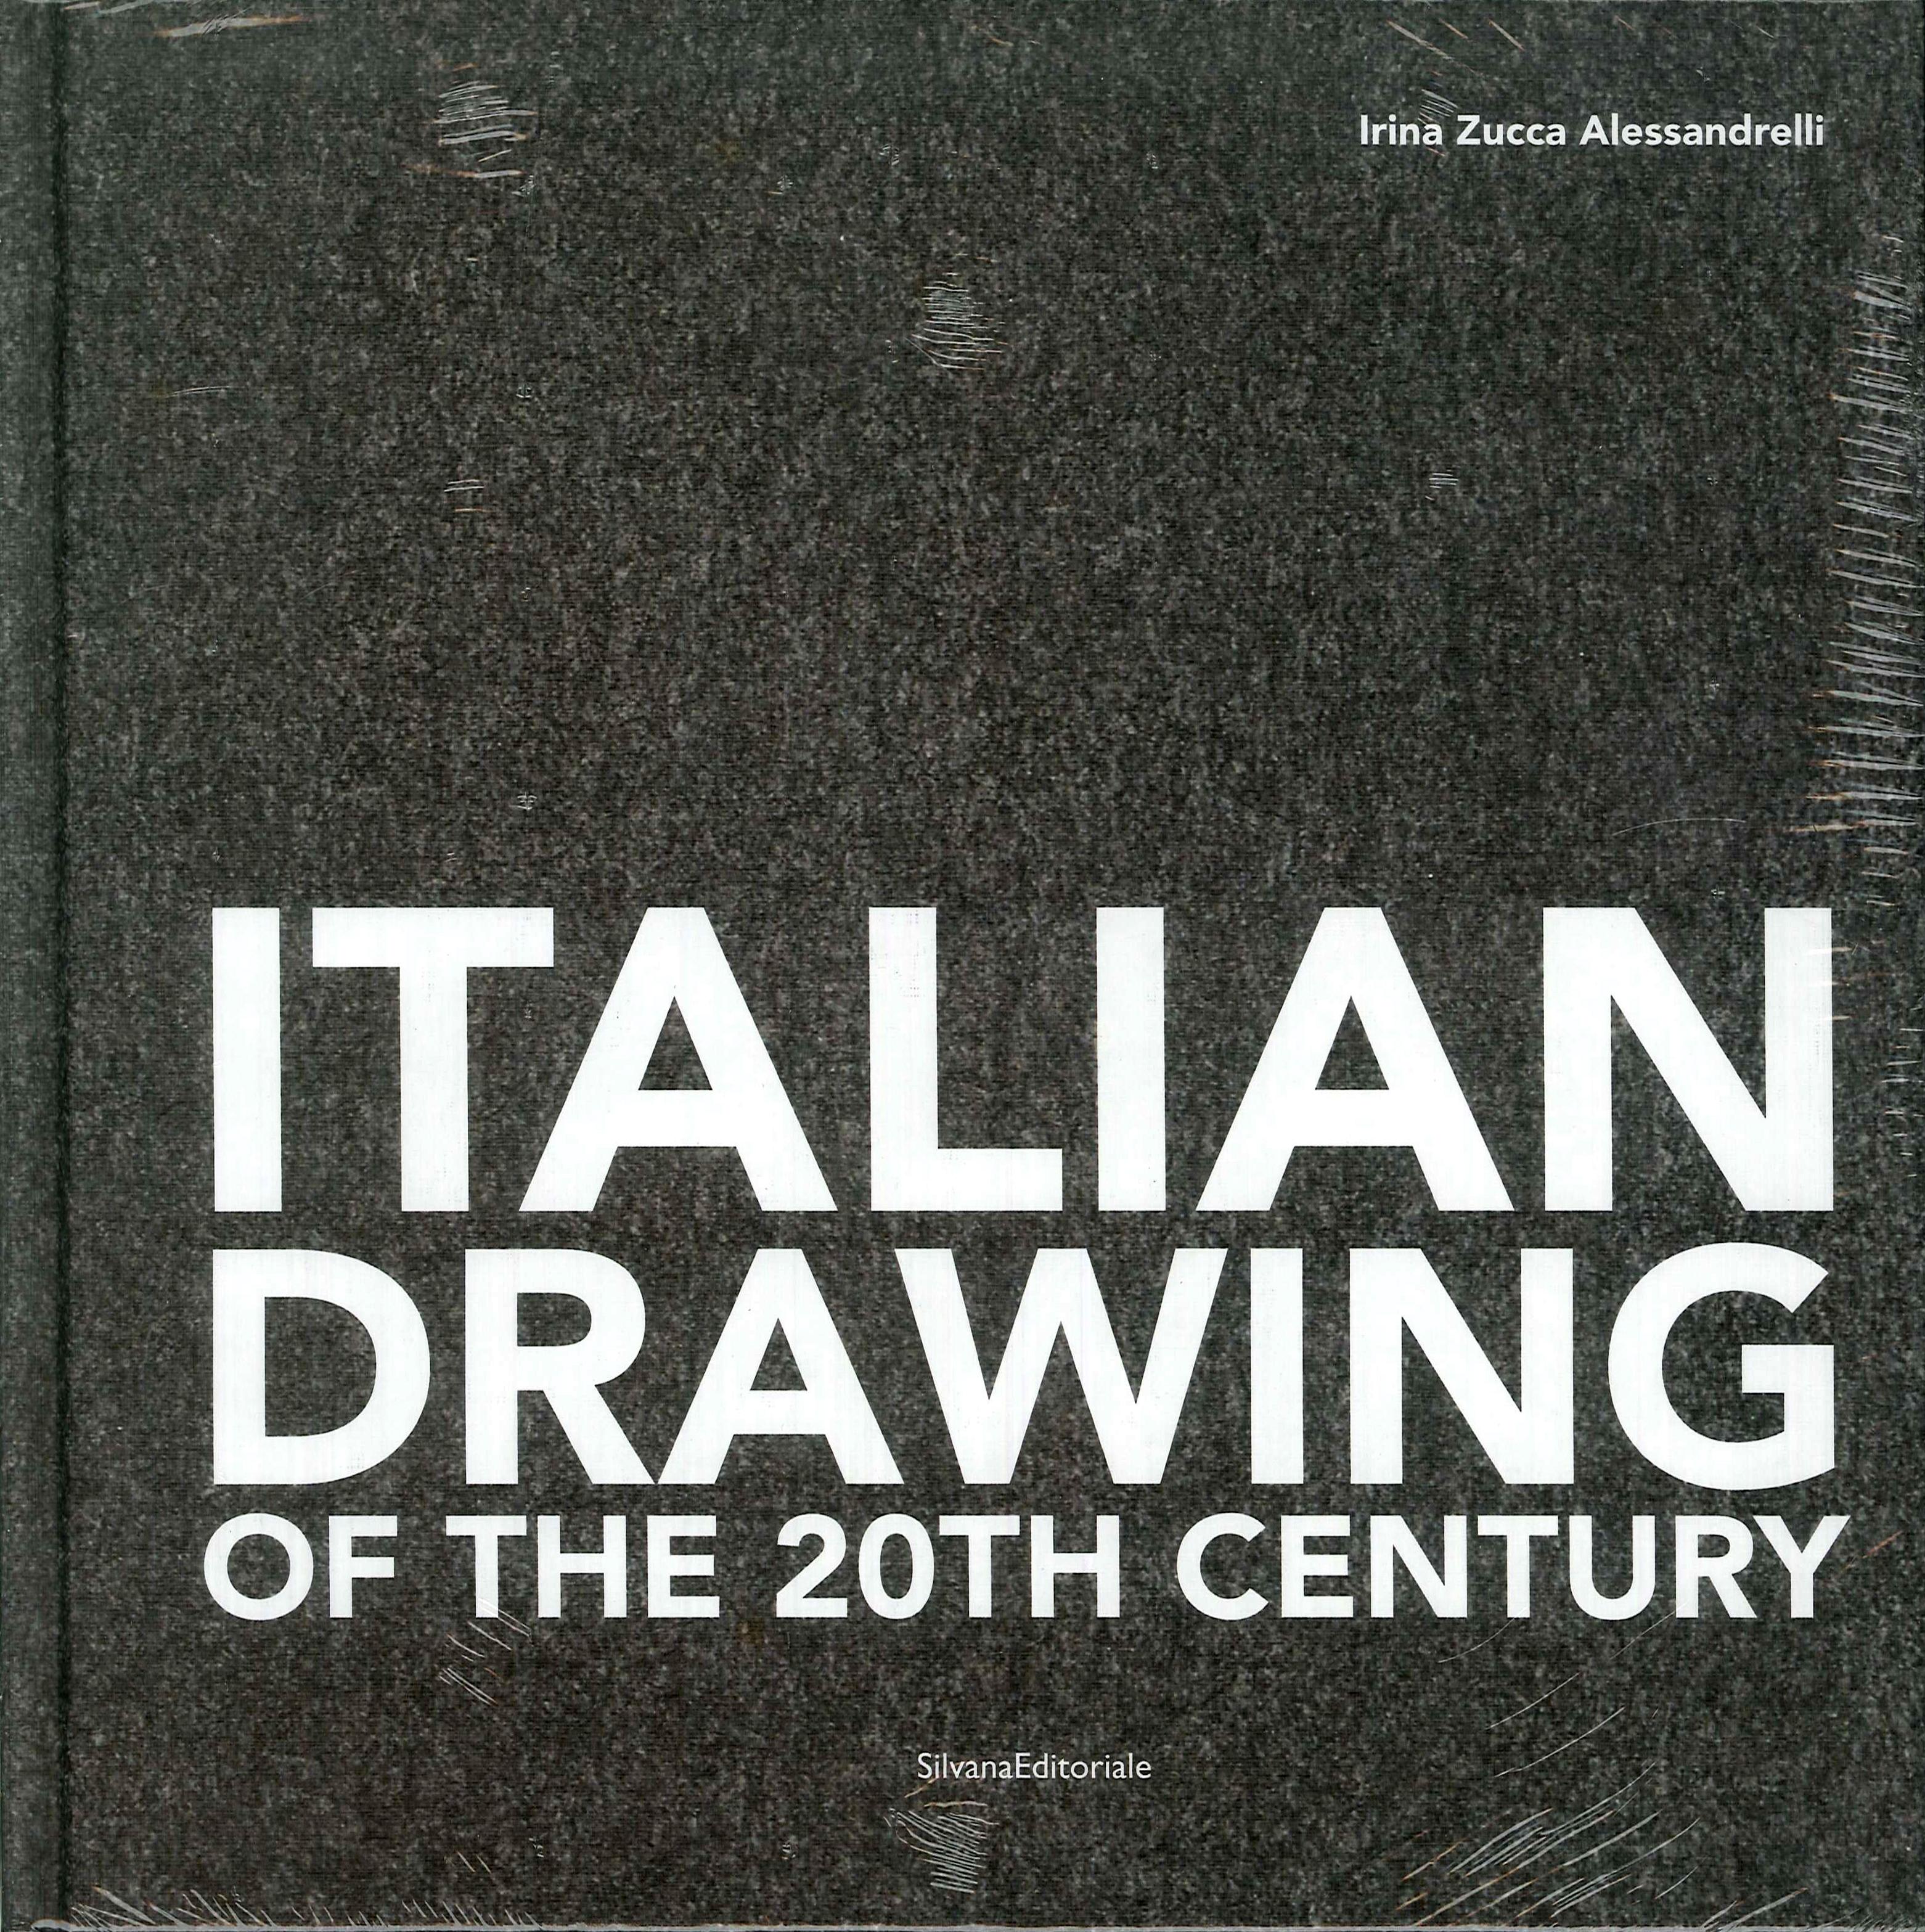 Italian Drawing of 20th Century.